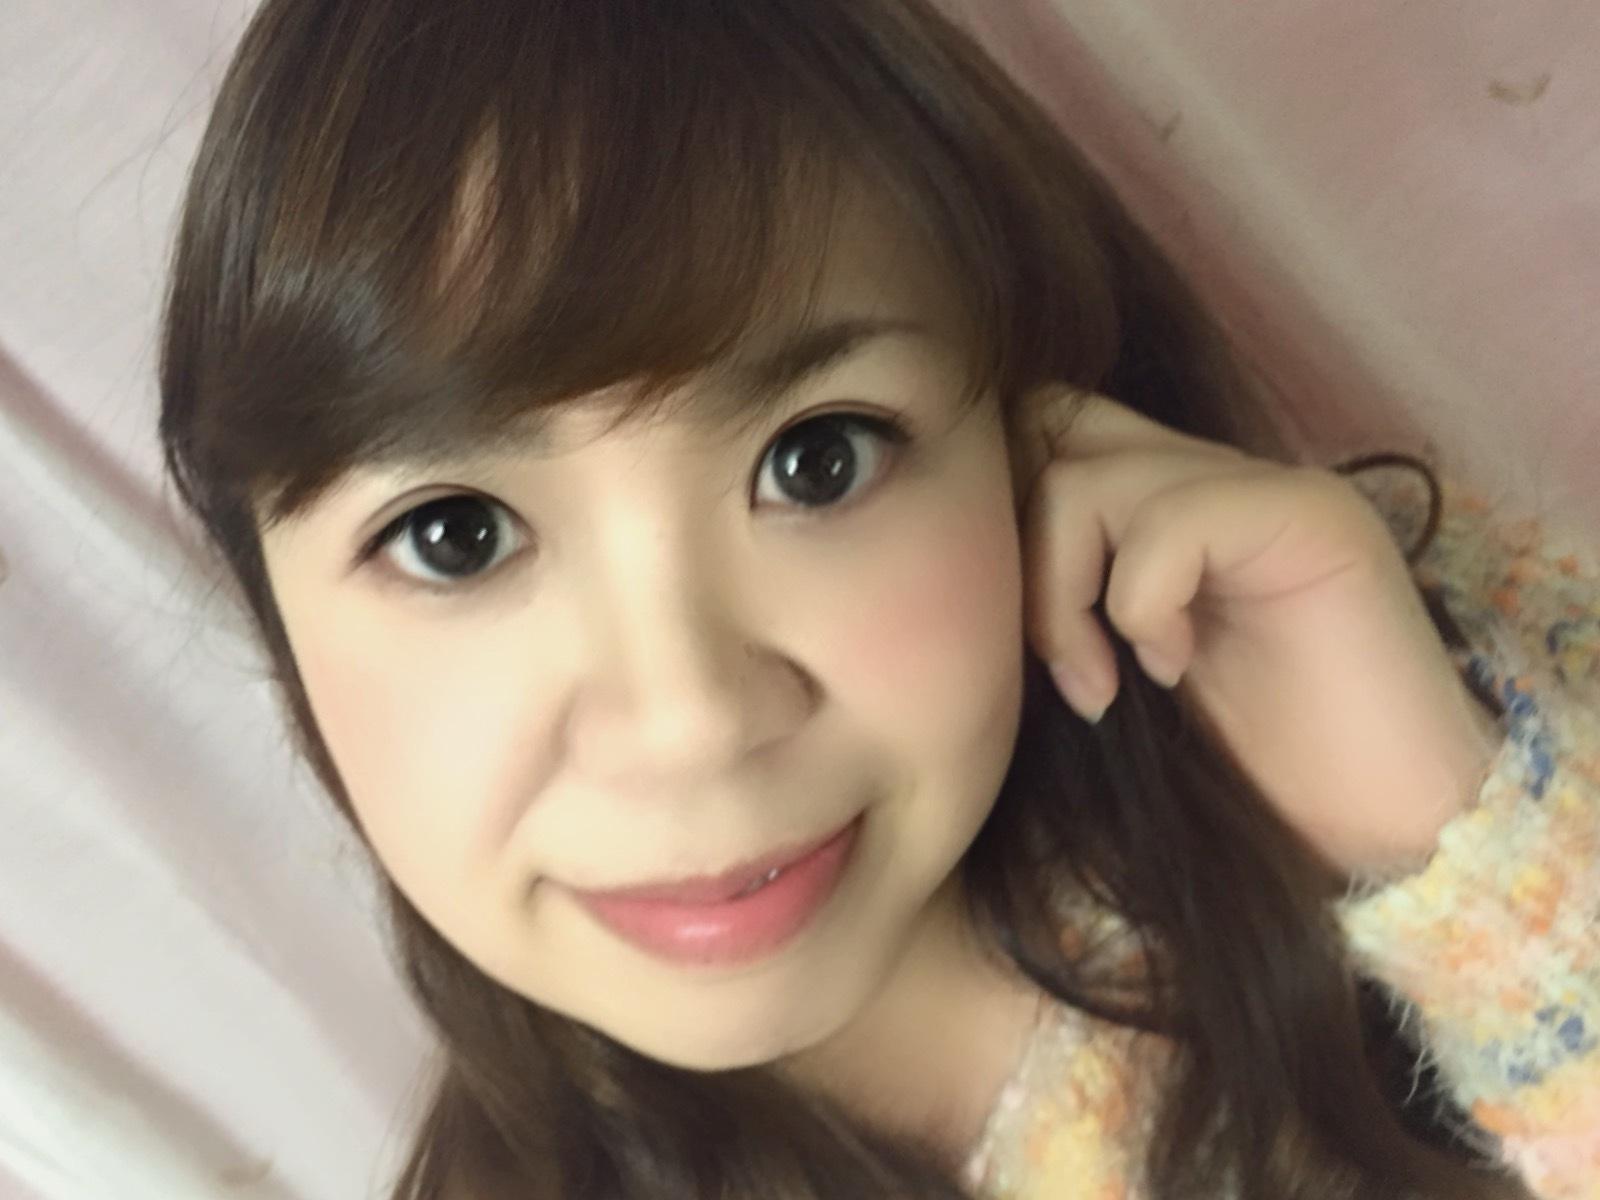 SHINOvちゃん  - 人妻系  アダルトチャットガール